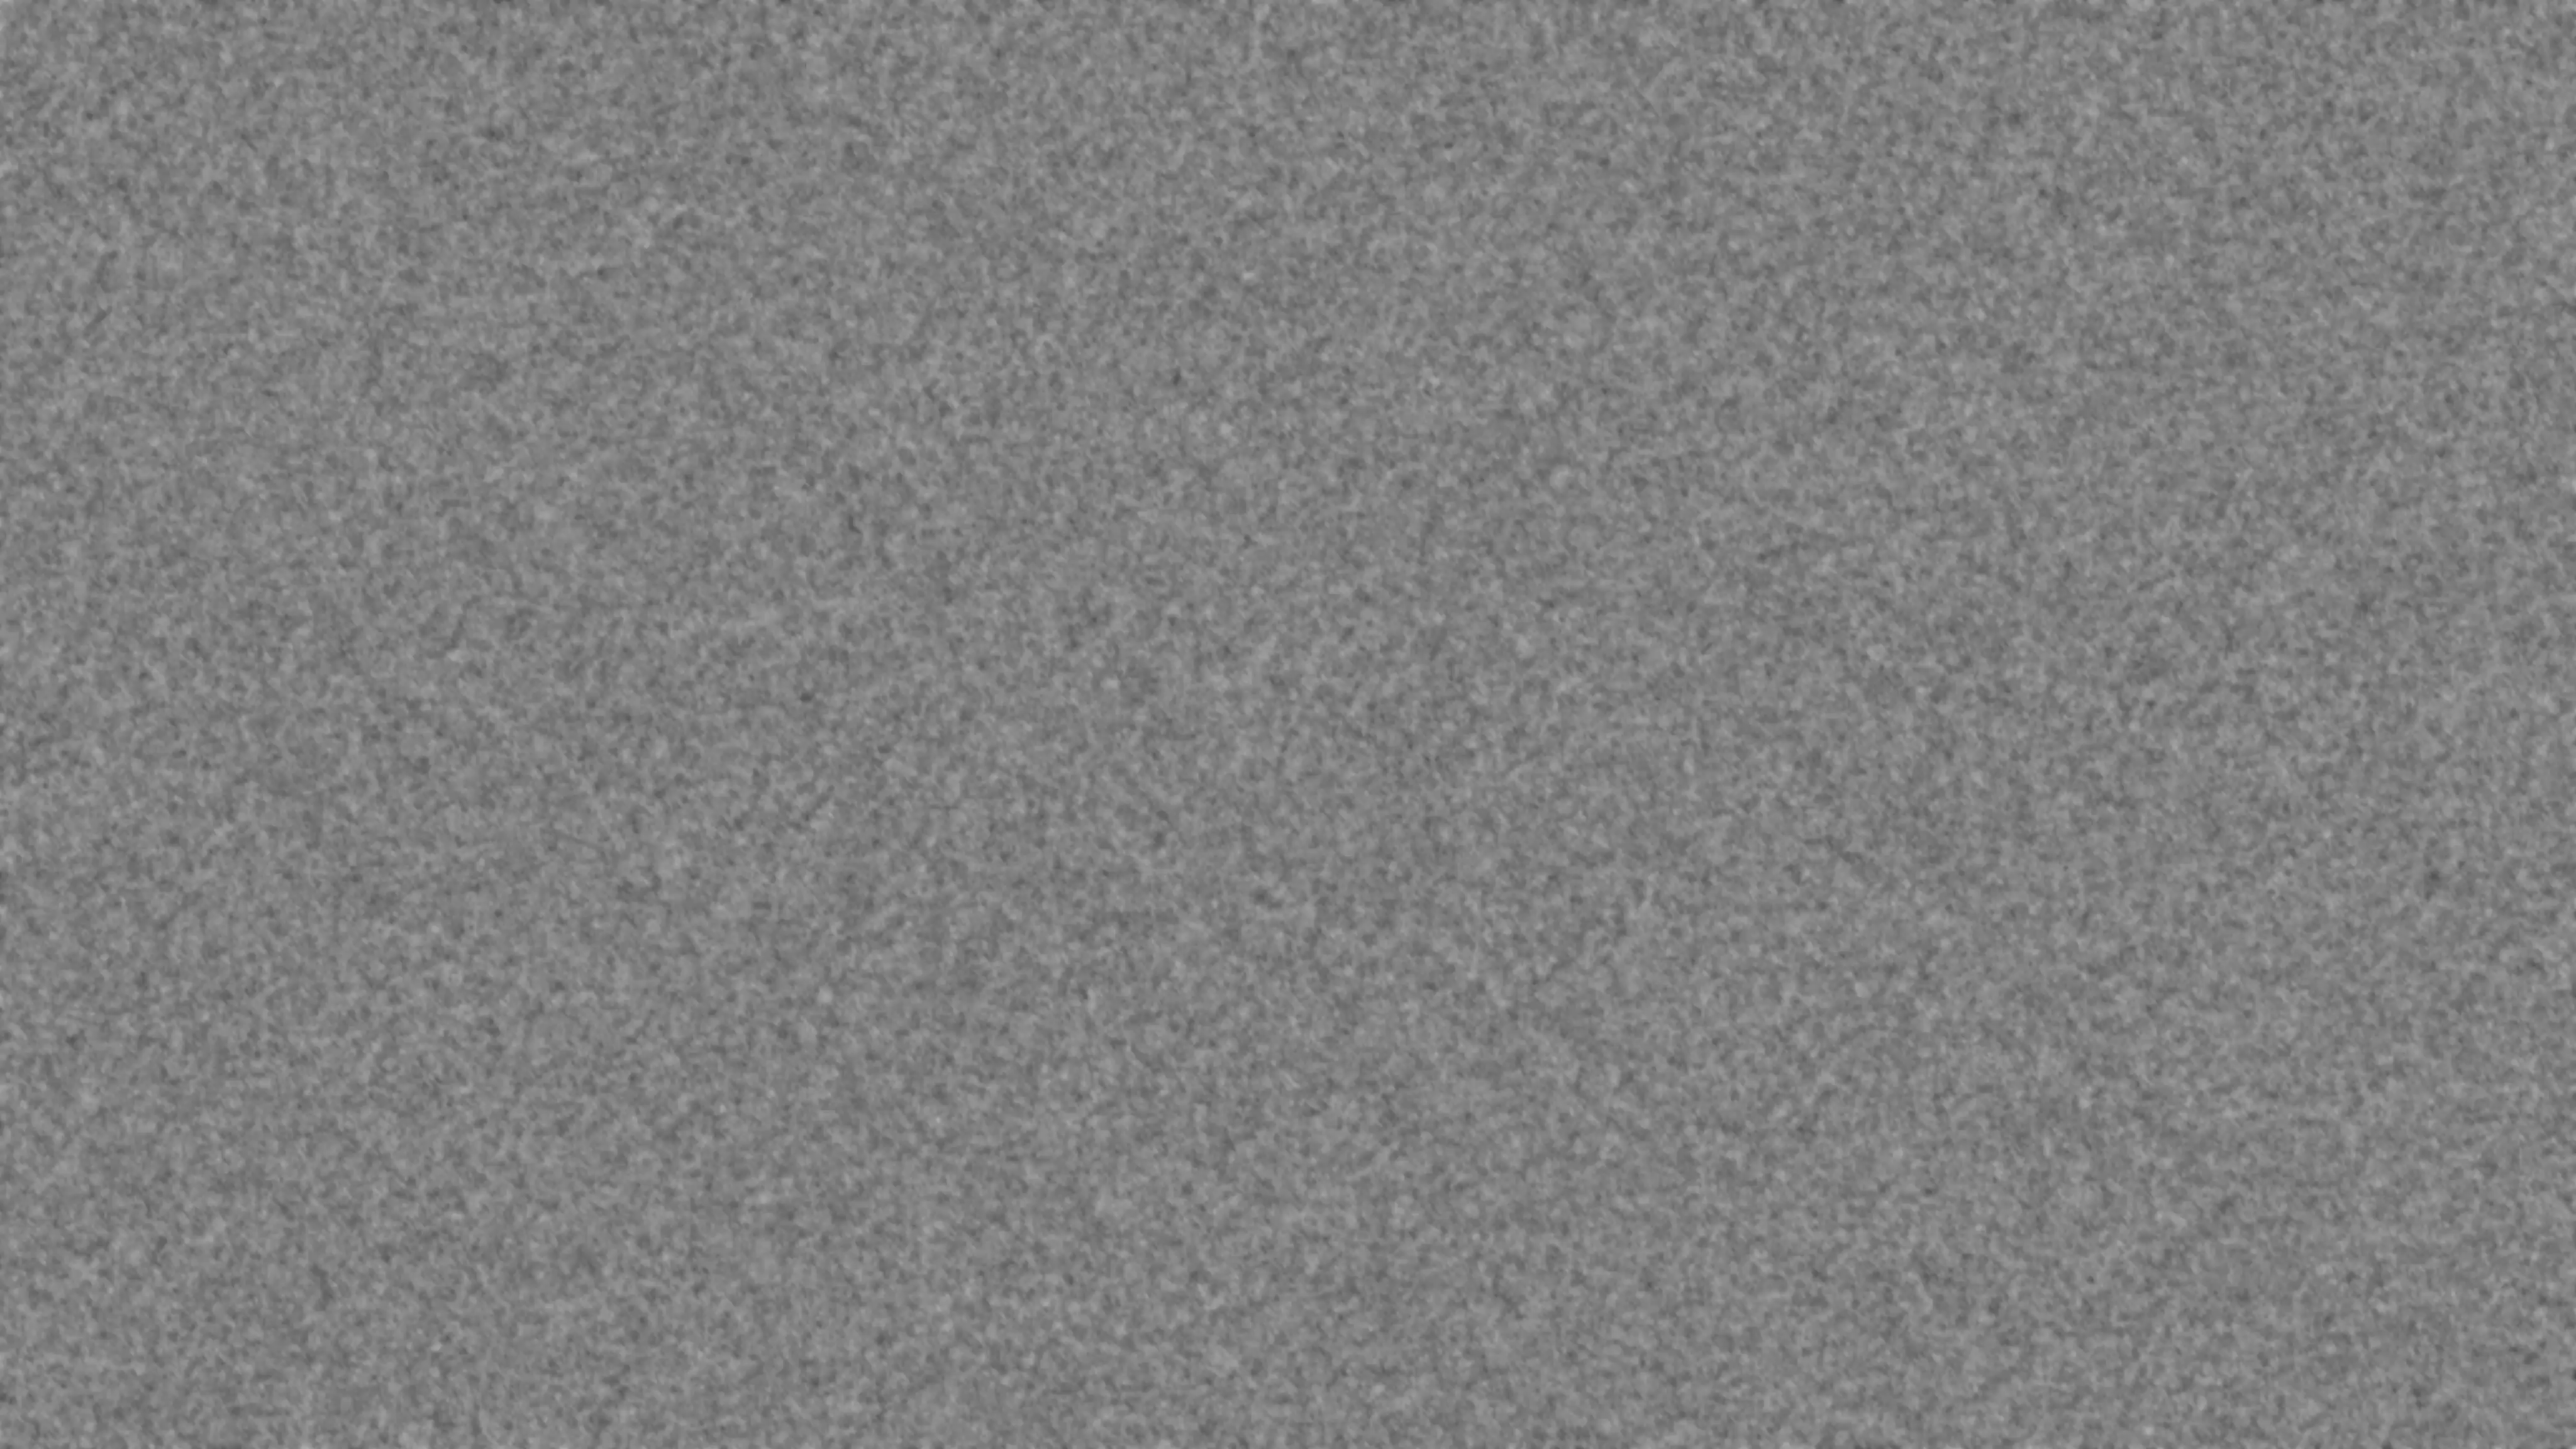 Grey,Silver,Flooring,Floor,Concrete,Asphalt,Tile,Metal #4634241.